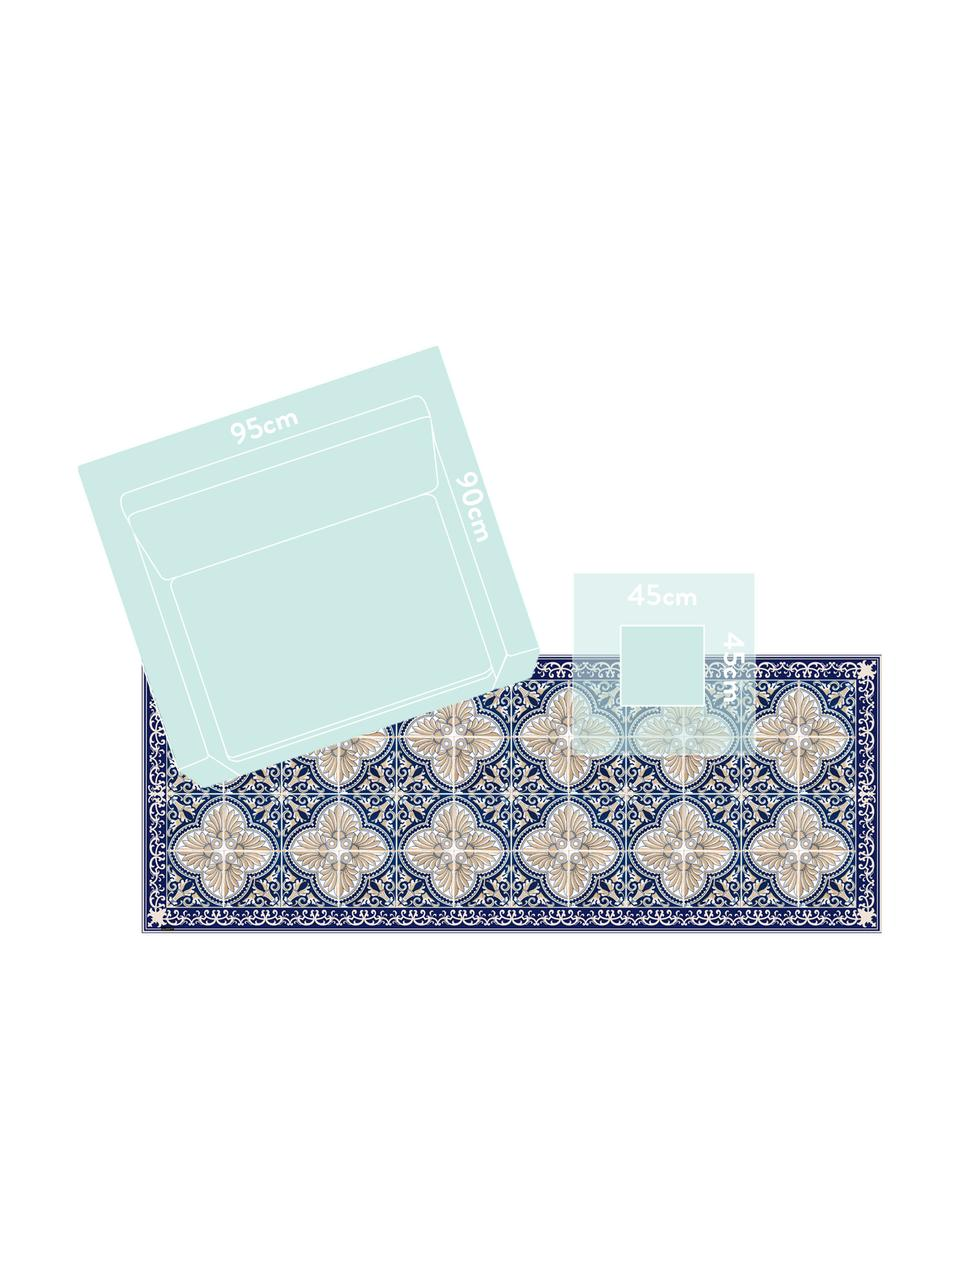 Vlakke vinyl vloermat Luis in blauw / beige, antislip, Recyclebaar vinyl, Donkerblauw, beige, 68 x 180 cm